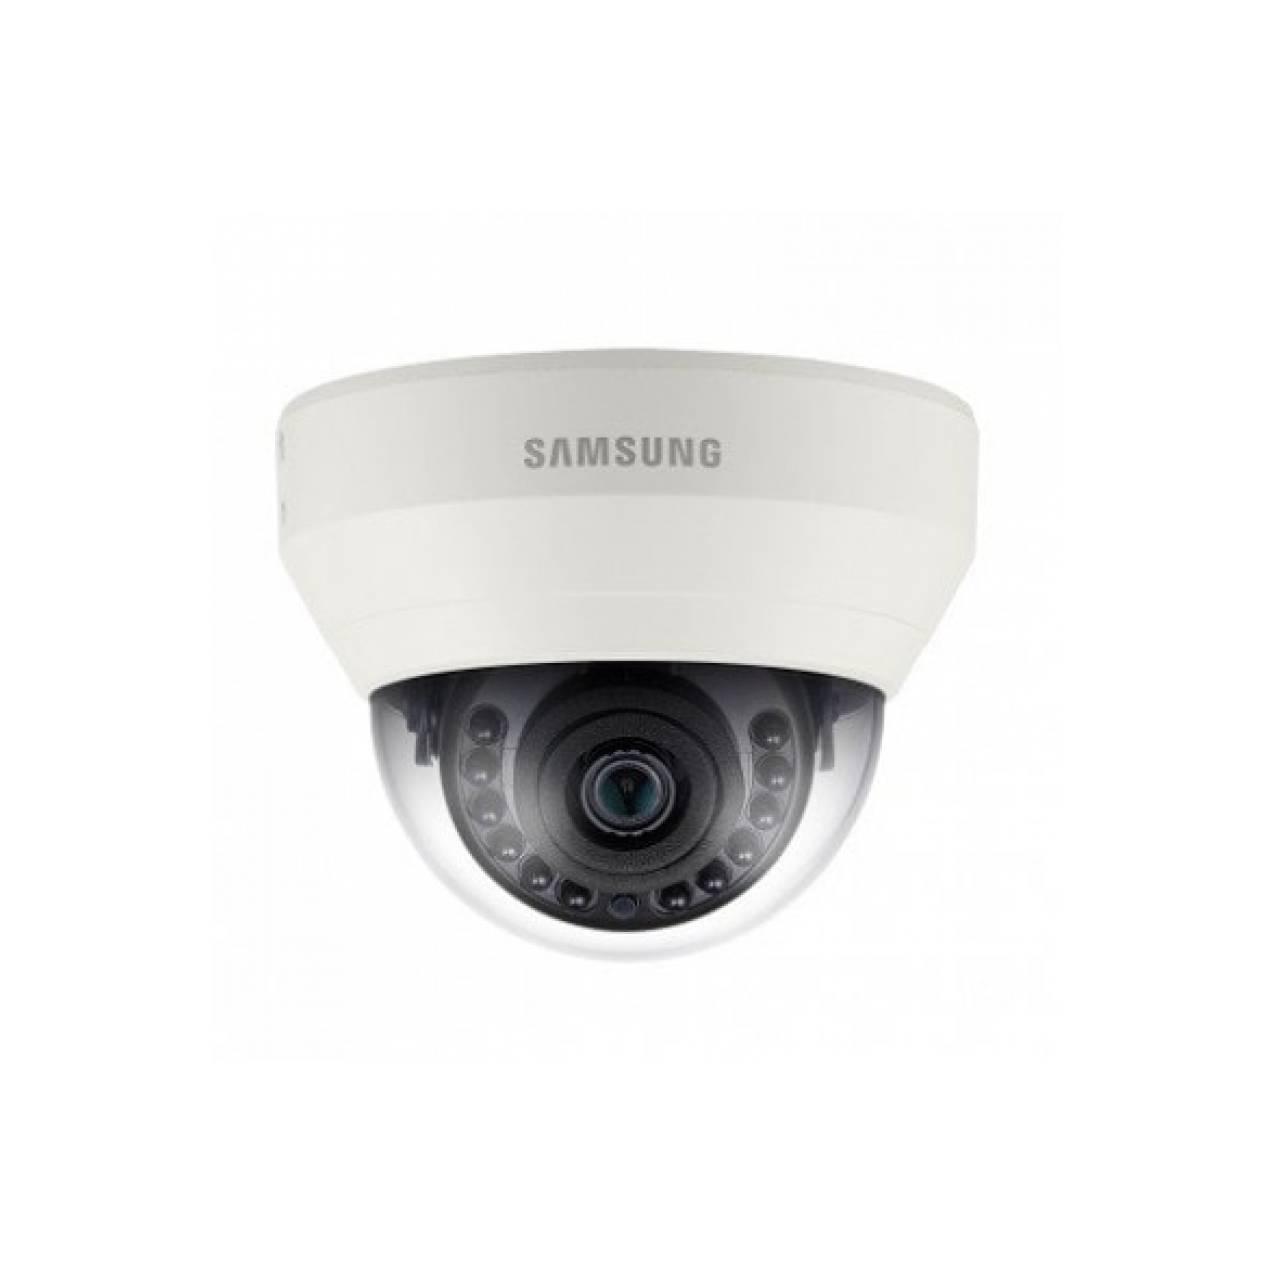 Kamera/camera CCTV INDOOR SAMSUNG AHD PLUS 2MP SCD-6023RP/SCD-6023R